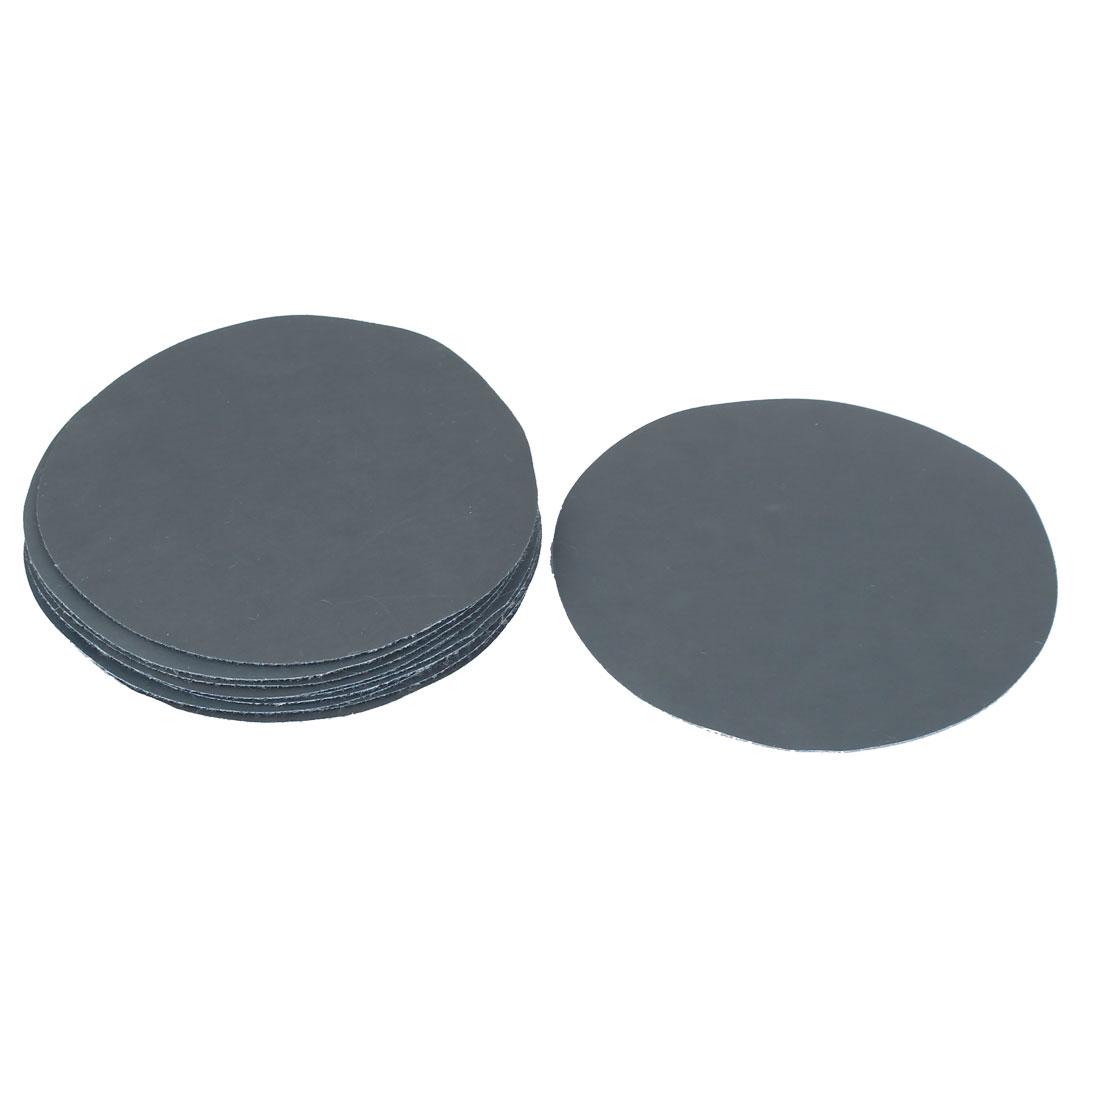 "4"" Dia 3000 Grit Abrasive Round Sanding Disc Sandpaper 10pcs for Oscillating Tool"